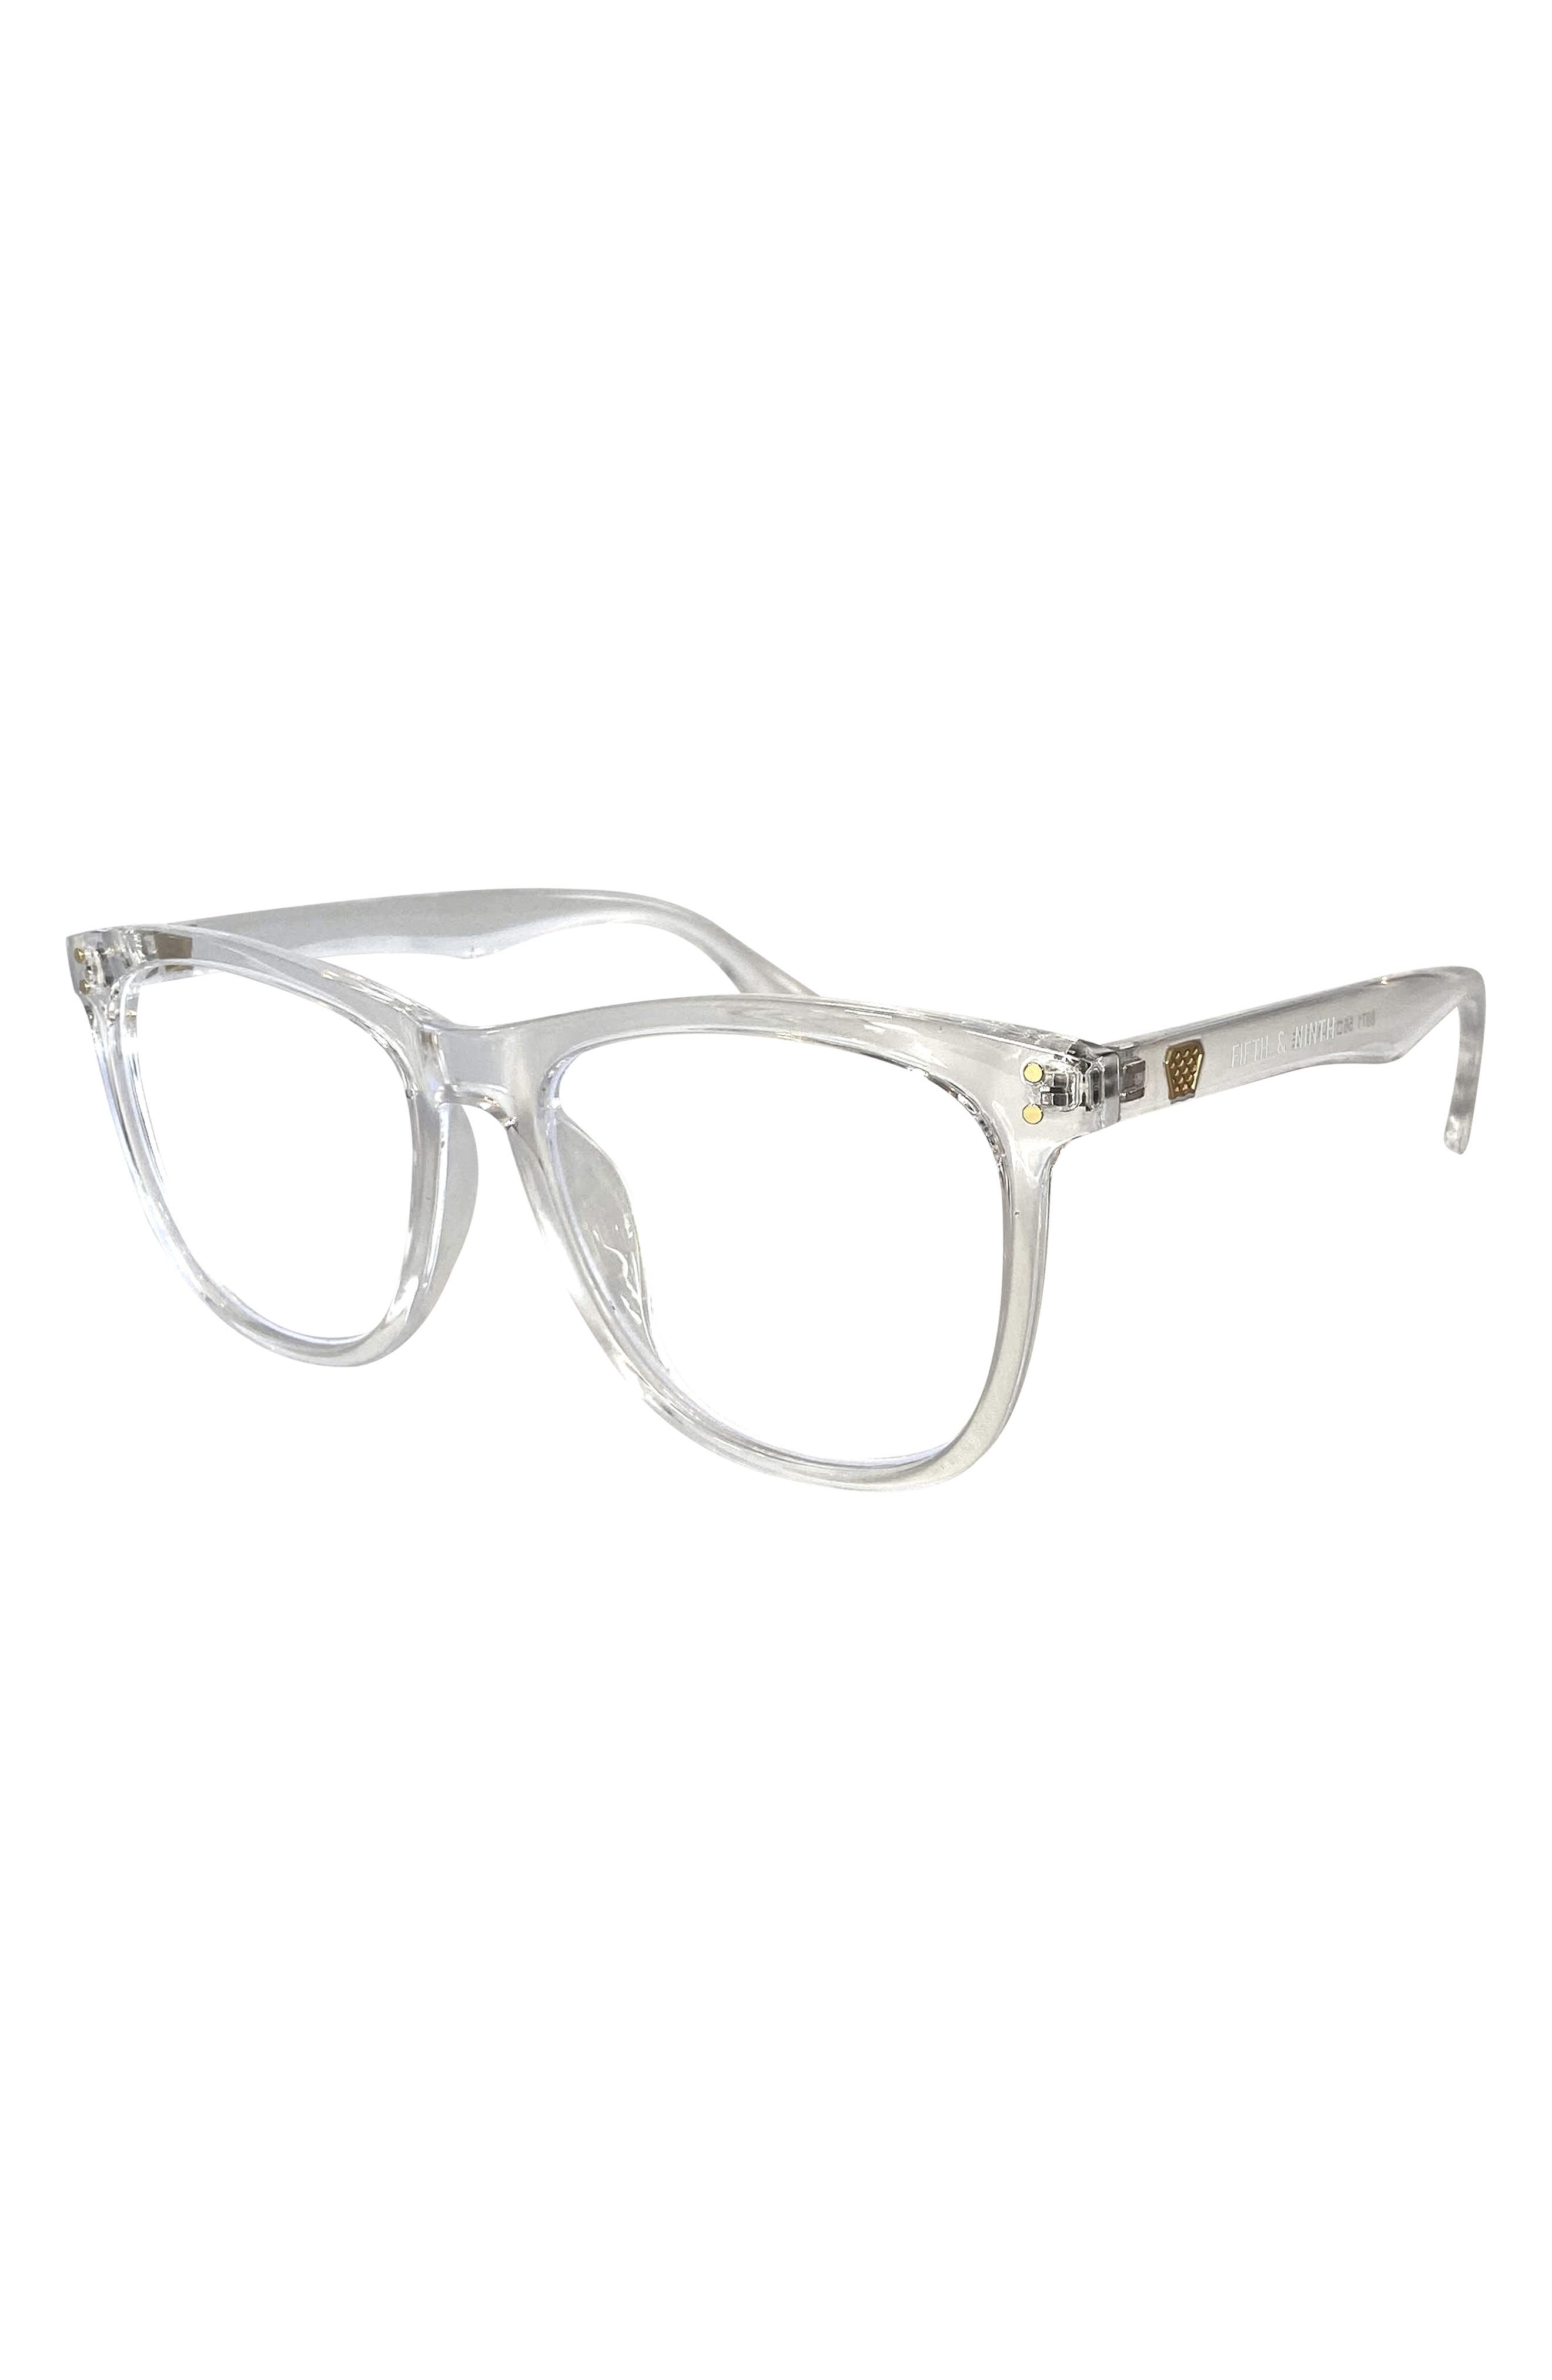 Mesa 56mm Round Blue Light Filtering Glasses